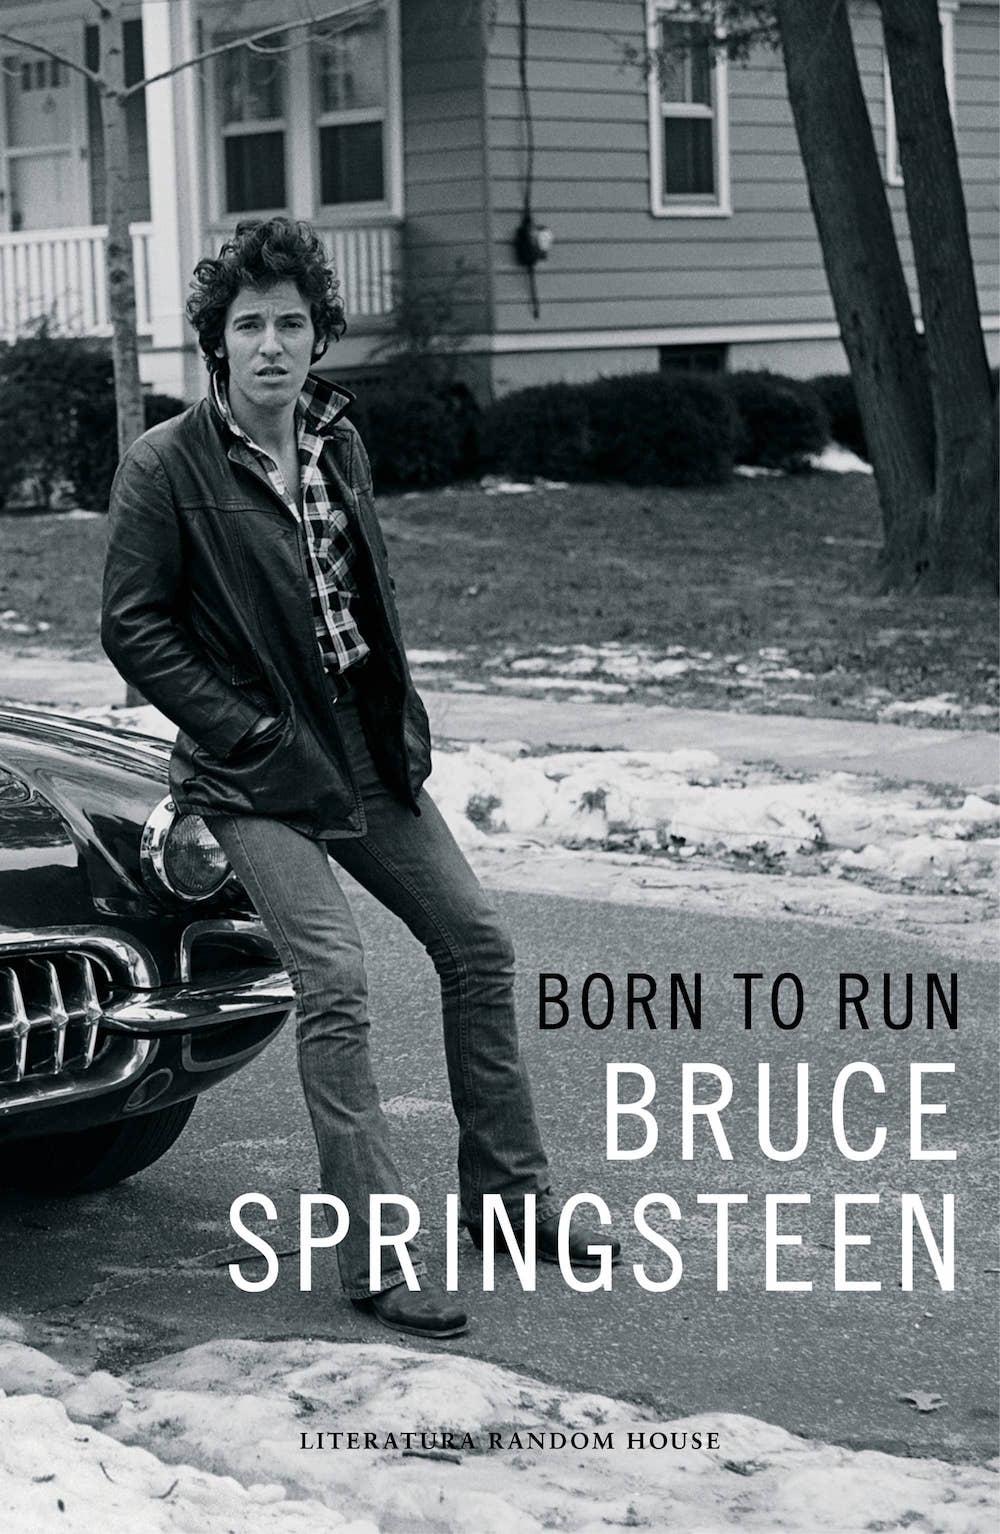 BORN TO RUN. BRUCE SPRINGSTEEN